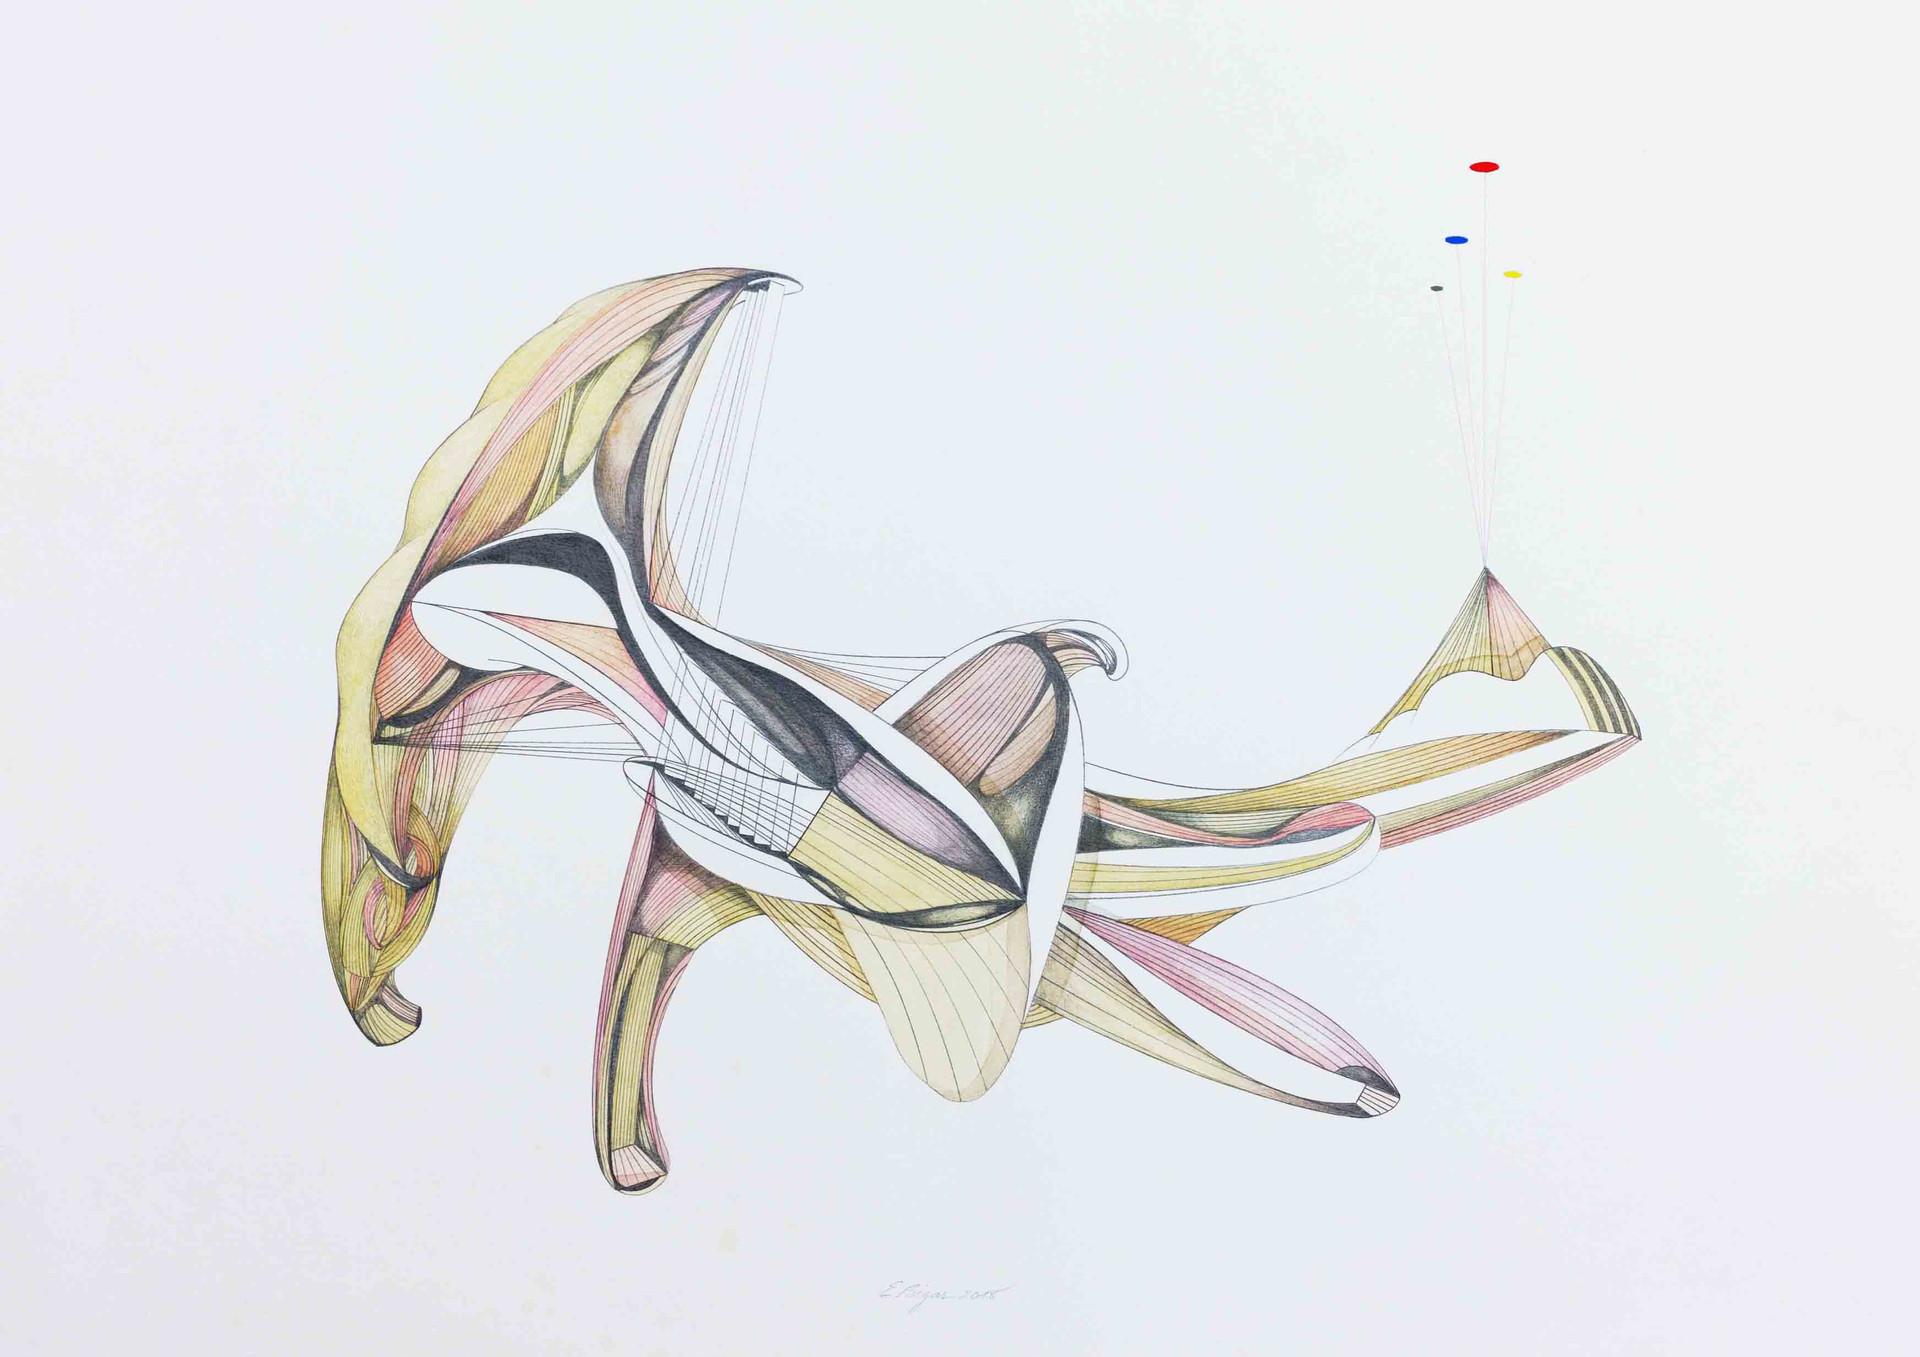 Cronus 2018 70x50cm Graphite pencil and watercolor on paper